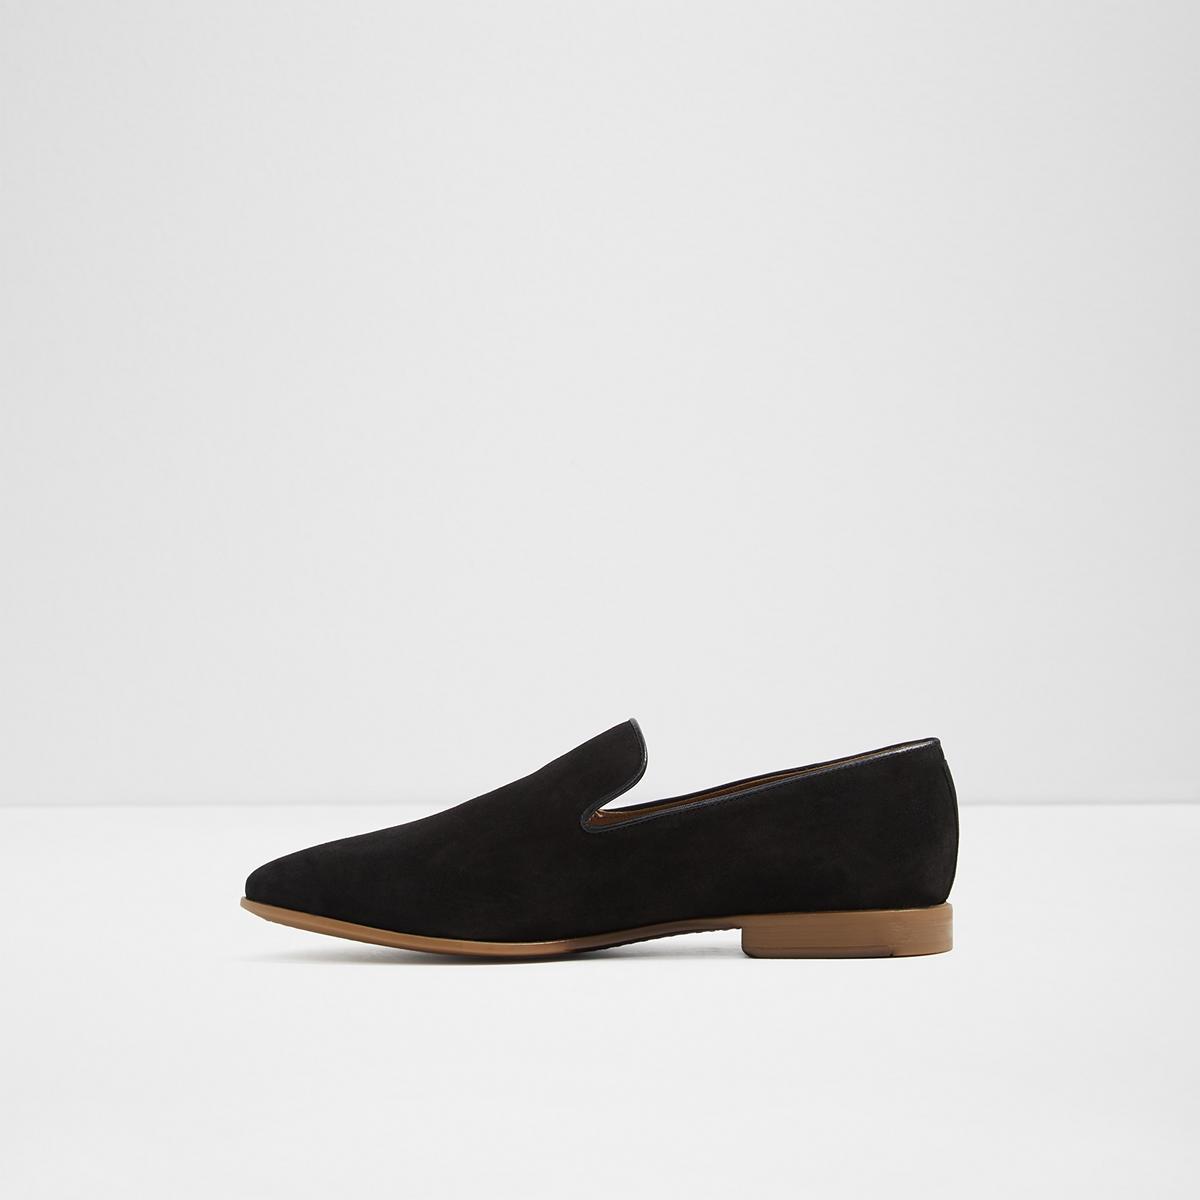 ALDO Tralisien slipper loafers in beige cheap price store c5yGqab